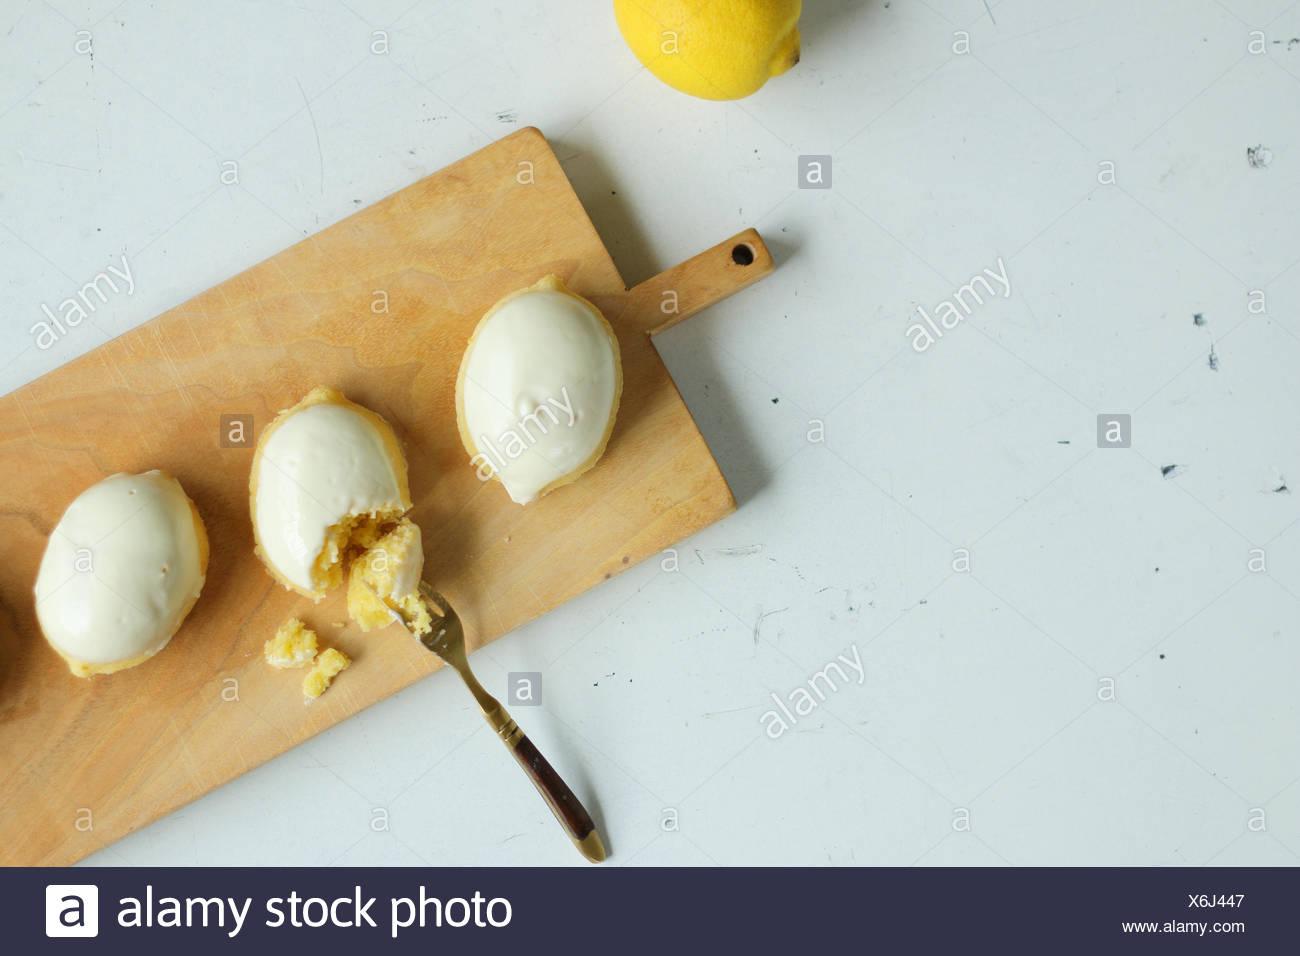 Yellow Or White Cake And Fresh Lemons